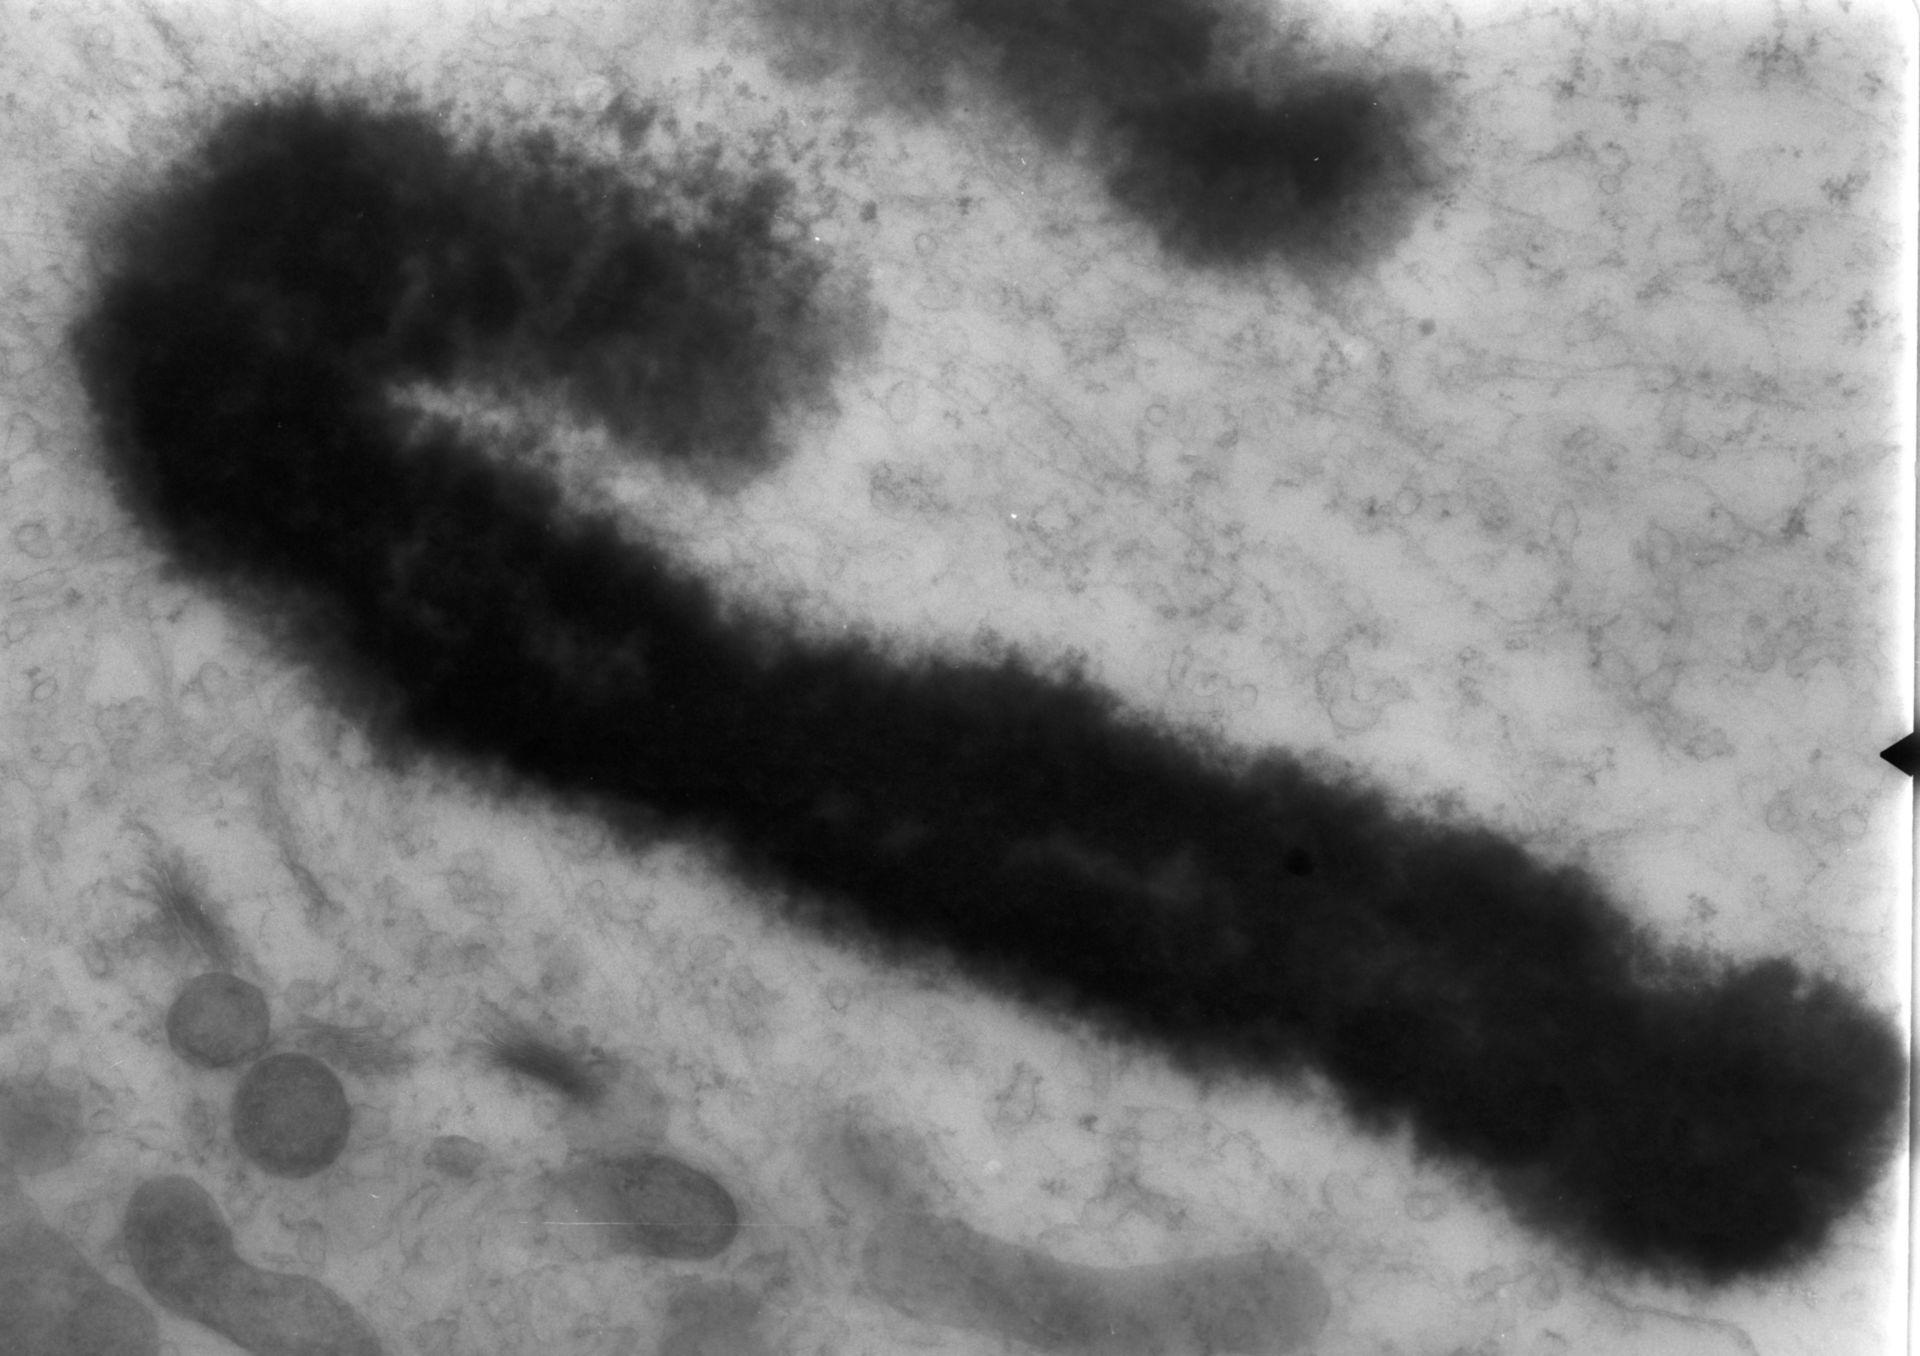 Haemanthus katharinae (Nuclear chromosome) - CIL:11914